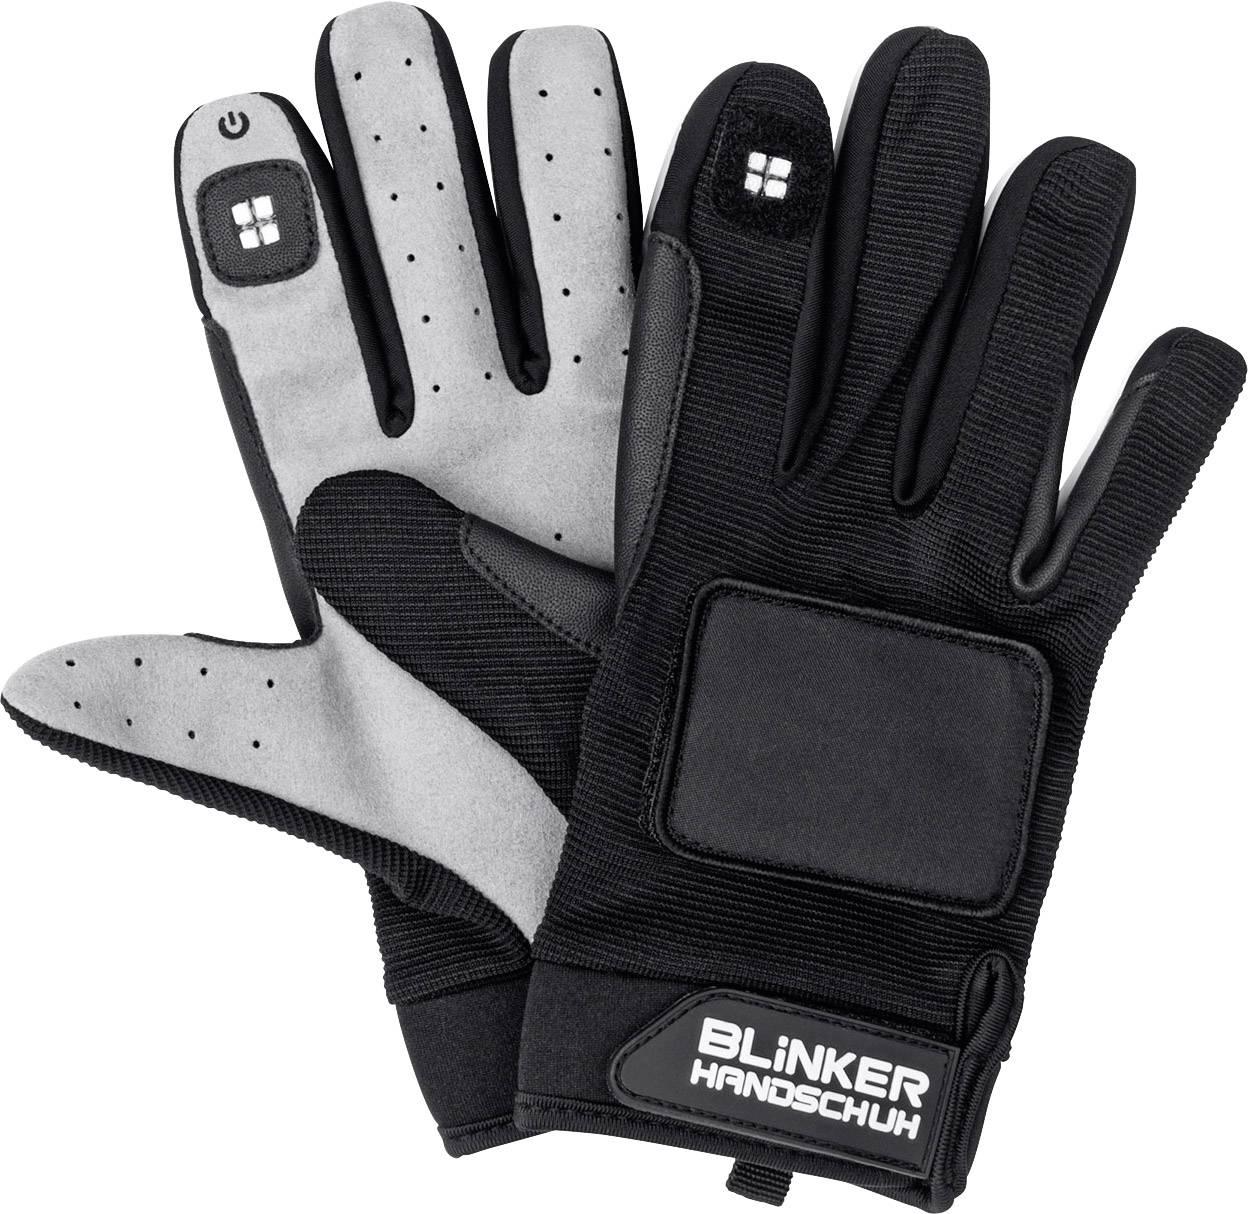 Rukavice a blinkrami Blinker Handschuh 0500, XL/XXL, 1 pár